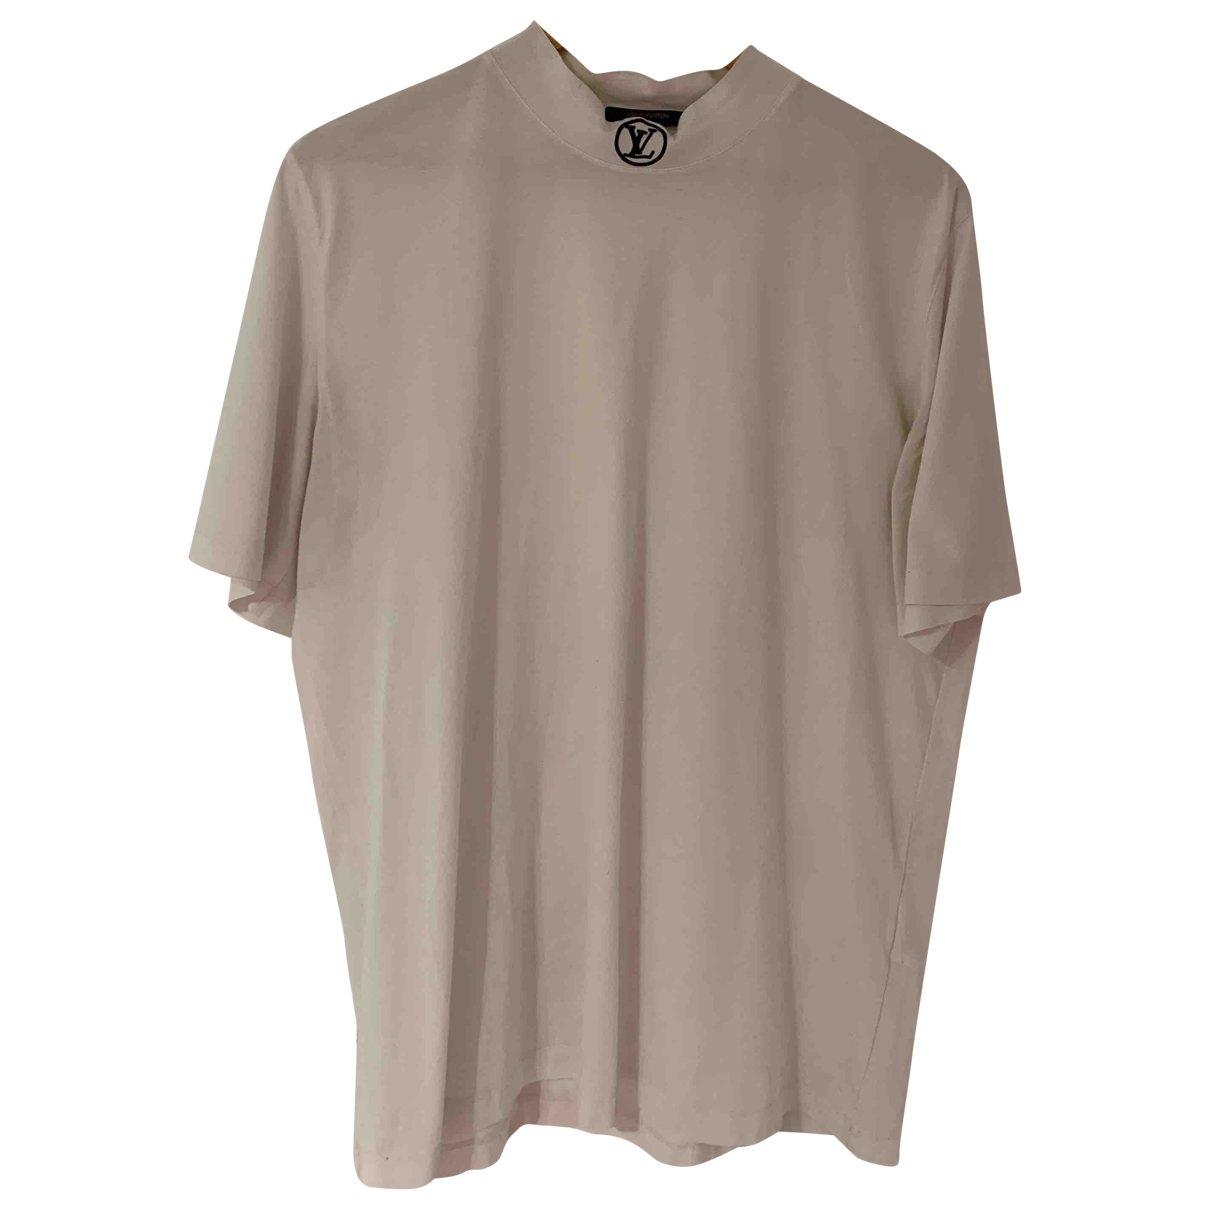 Louis Vuitton \N T-Shirts in  Weiss Baumwolle